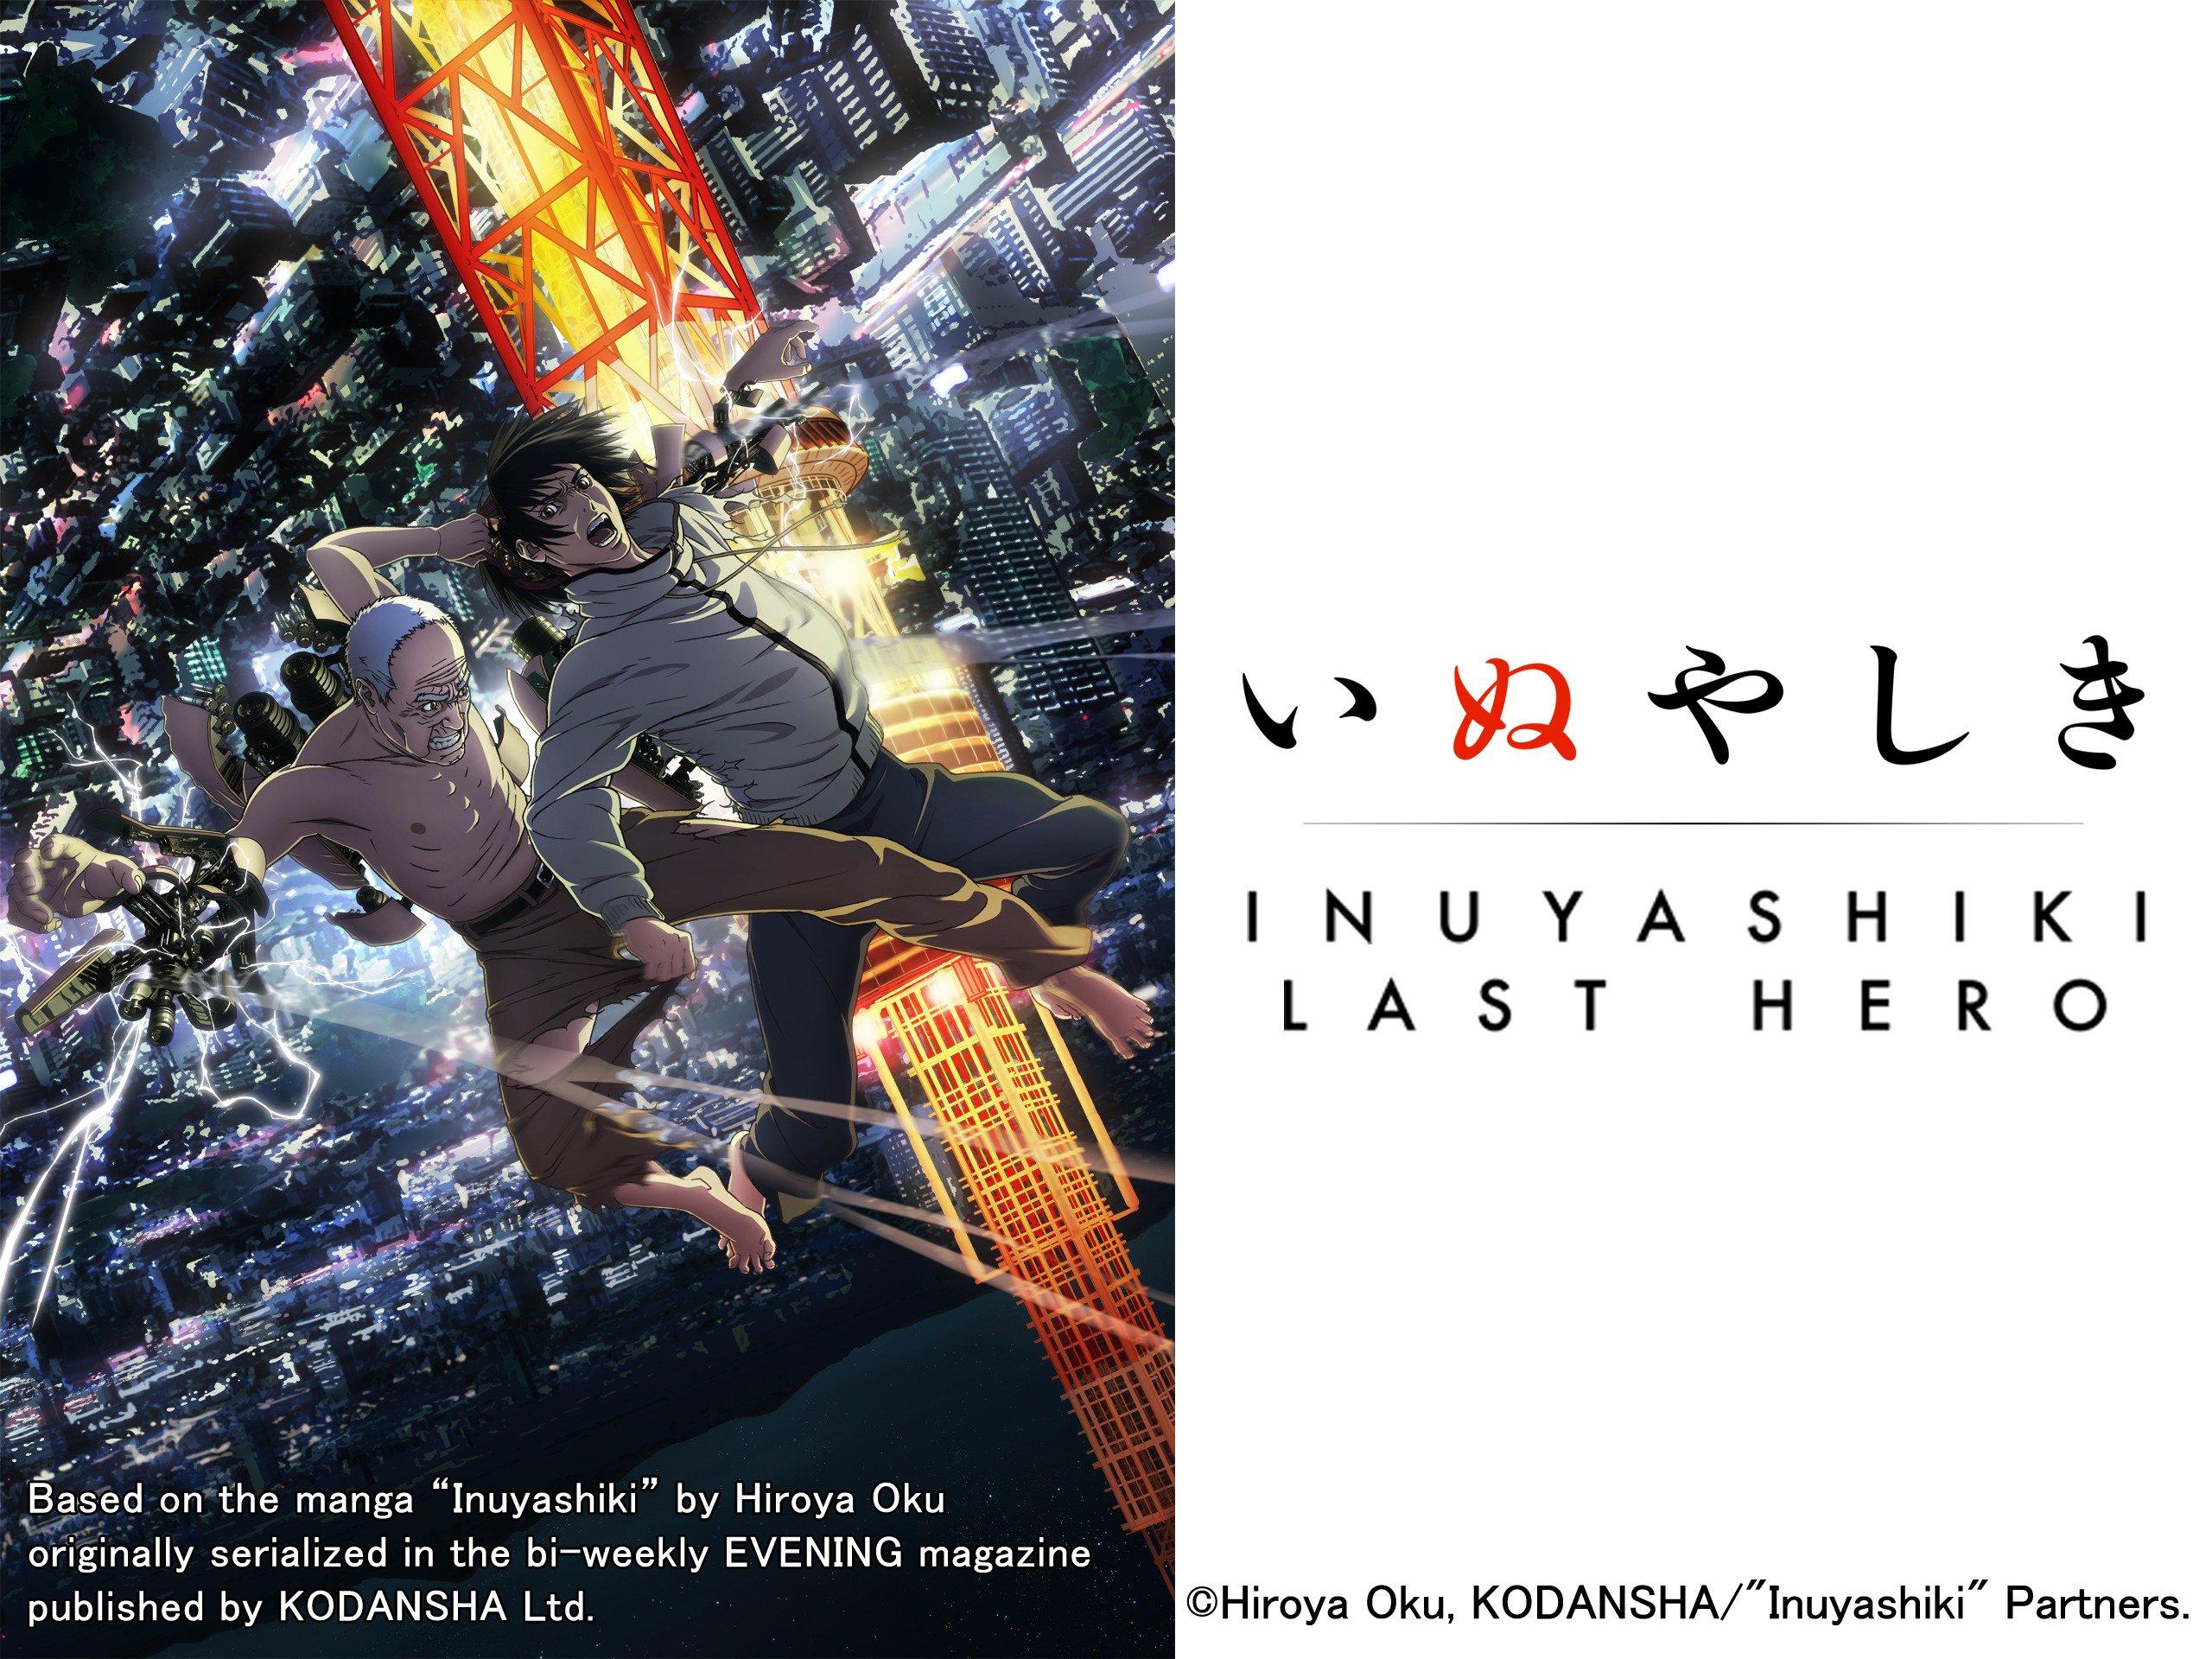 INUYASHIKI LAST HERO - Season 1